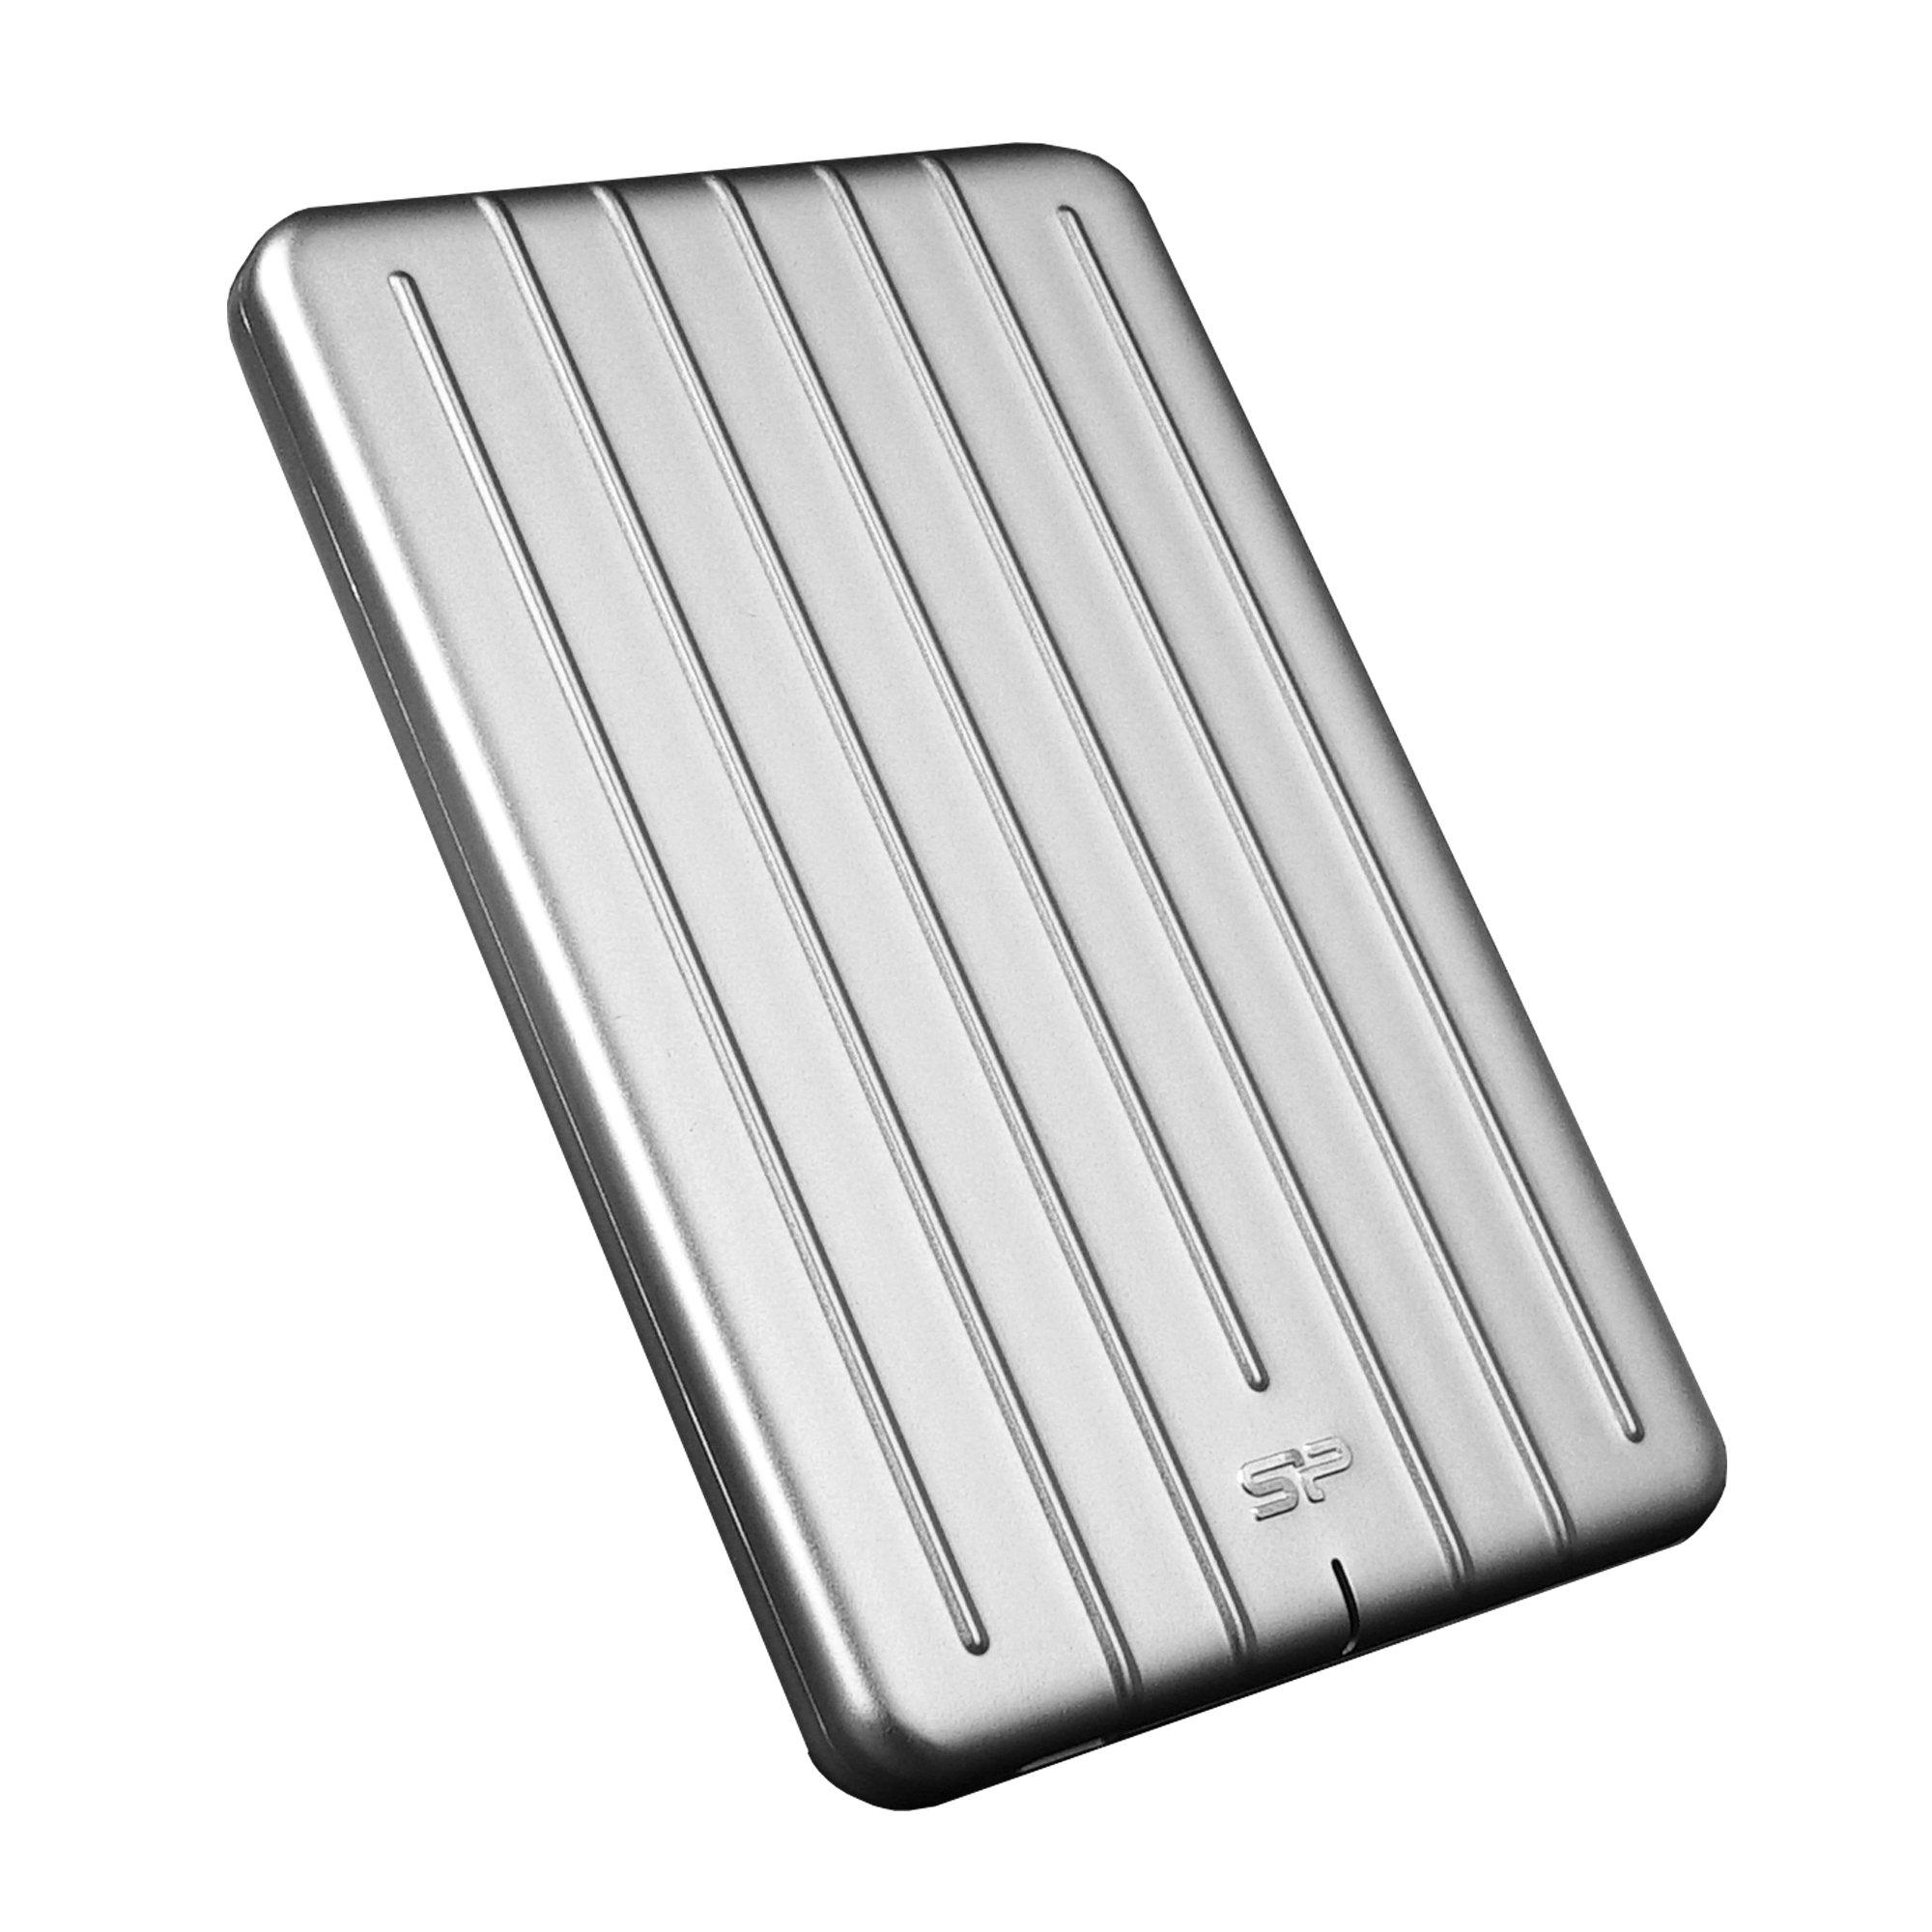 Silicon Power SU010TBPHDA75S3SAE 1TB Ultra Slim Rugged Armor A75 Shockproof USB 3.0 (USB 3.1 Gen 1) 2.5'' Portable External Hard Drive, Silver